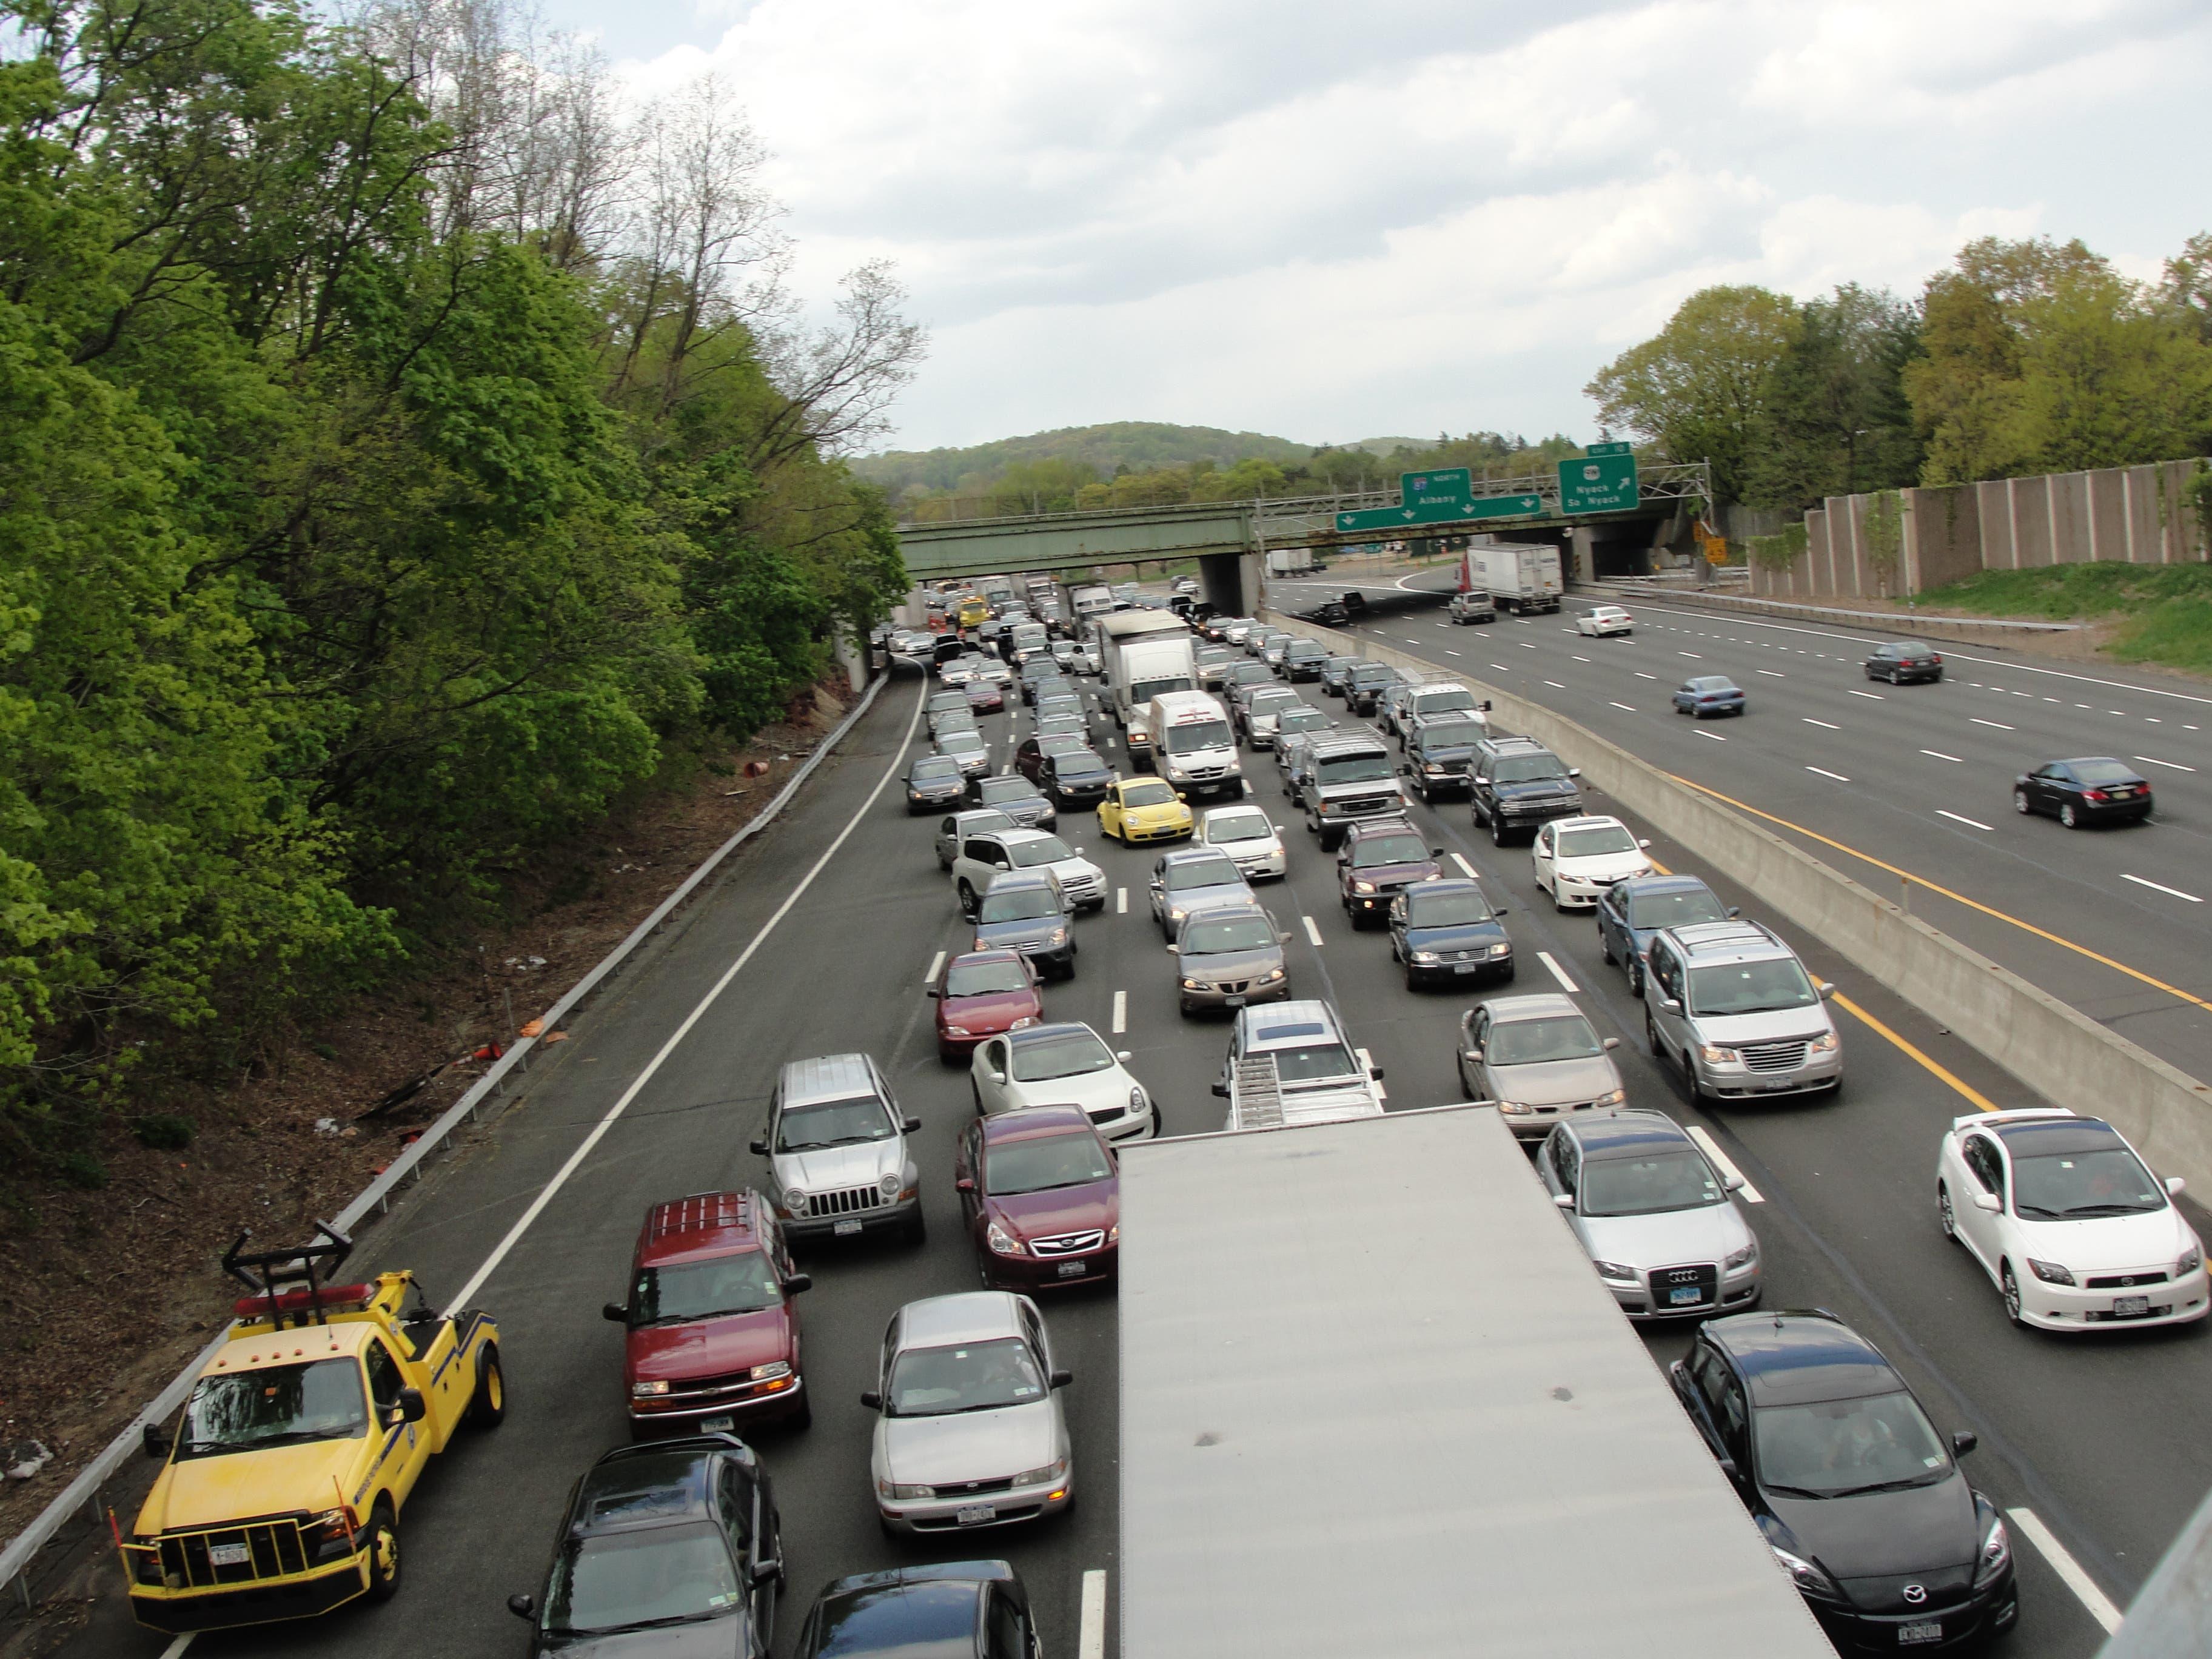 Thruway Officials Warn of Heavy Traffic this Weekend through